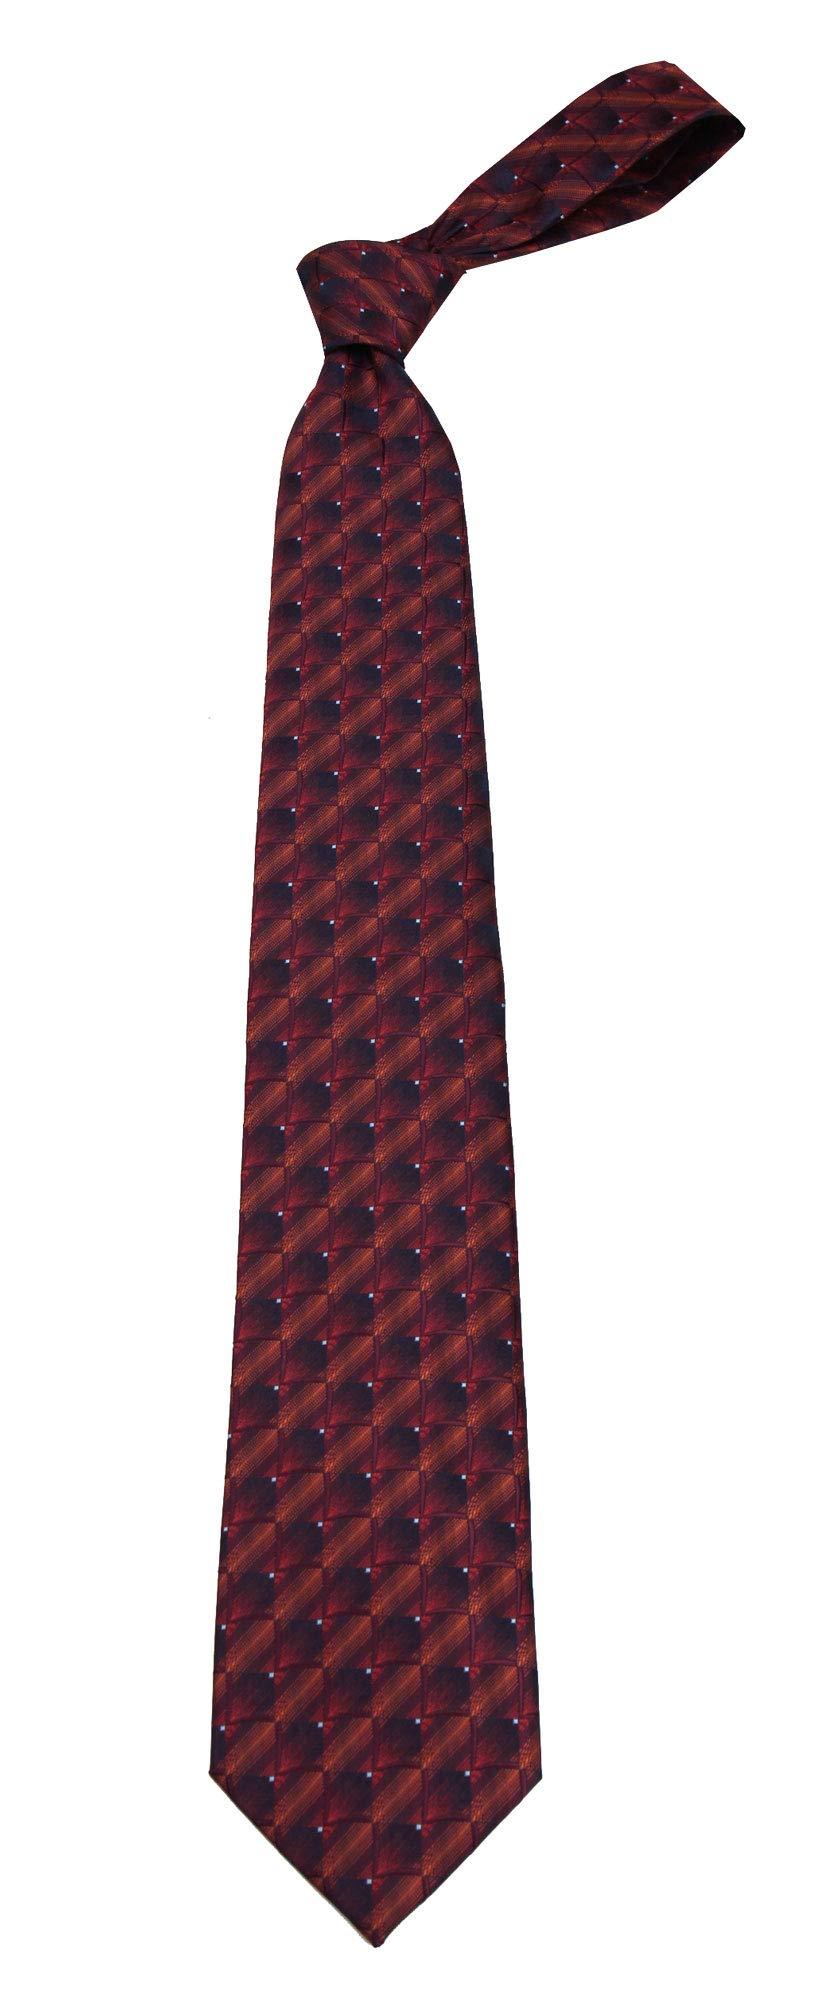 B-11690 - Boys Youth Burgundy Pattern Designer Necktie Ties